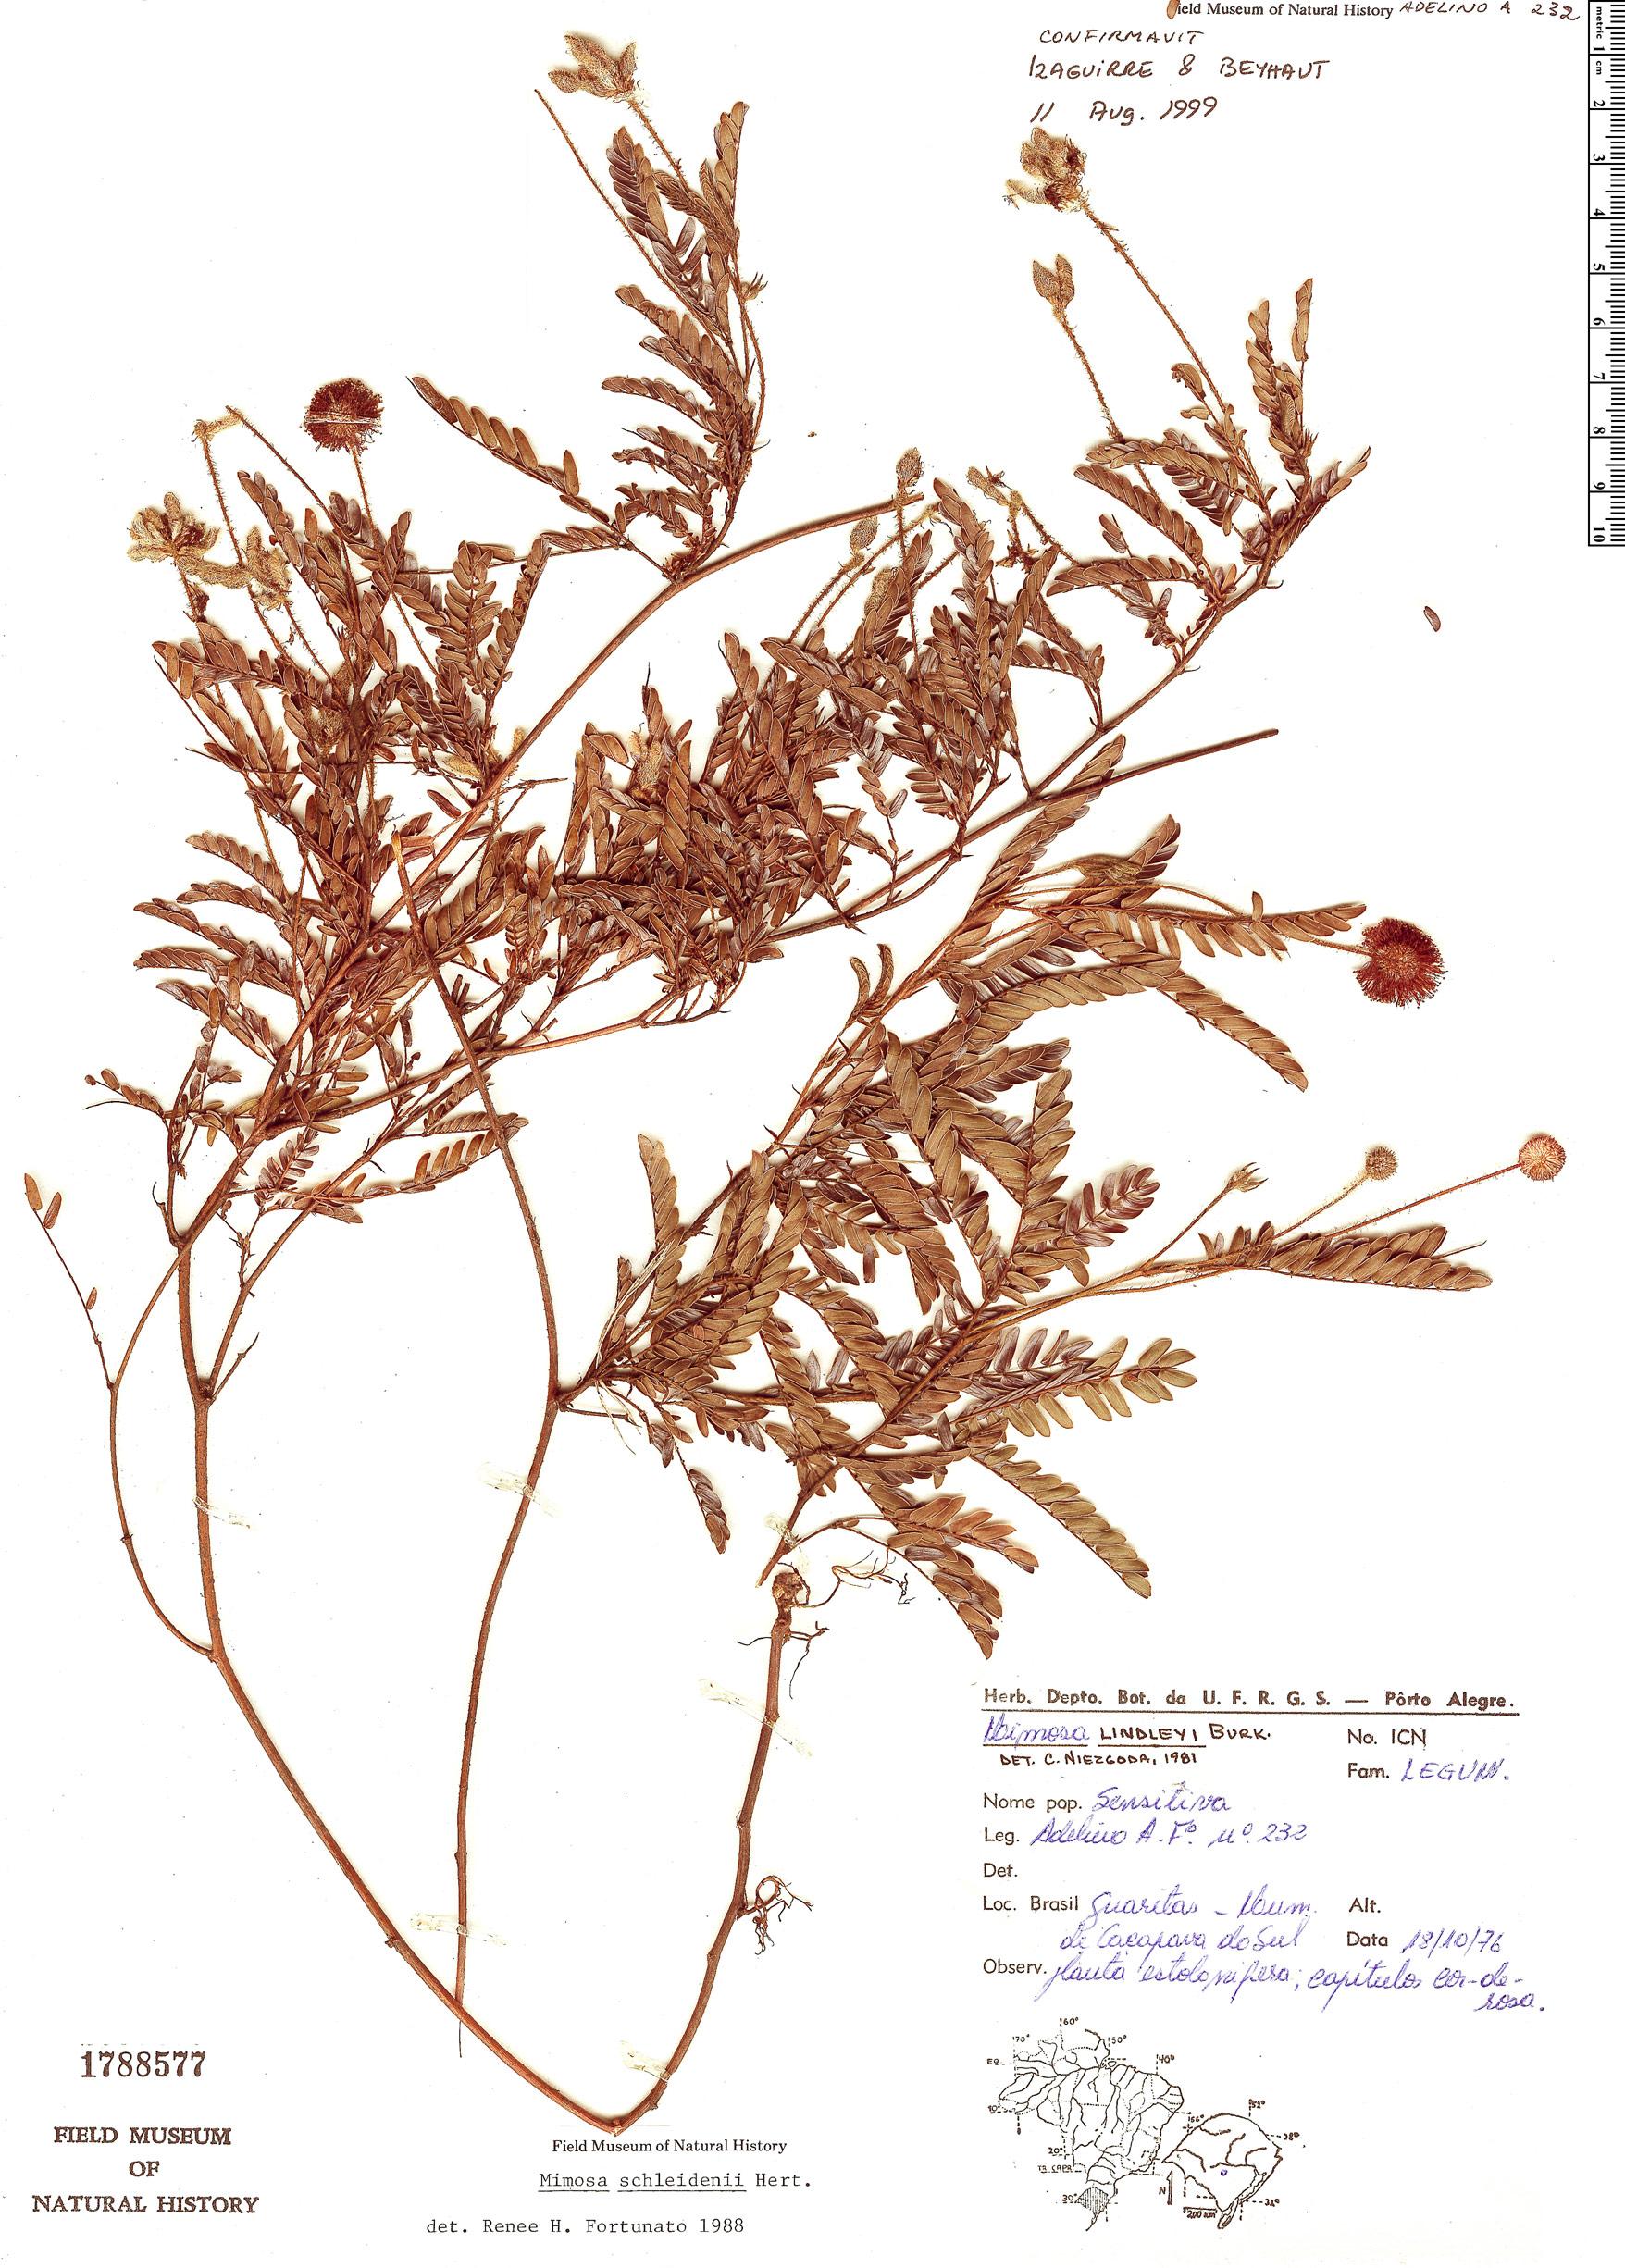 Espécime: Mimosa schleidenii